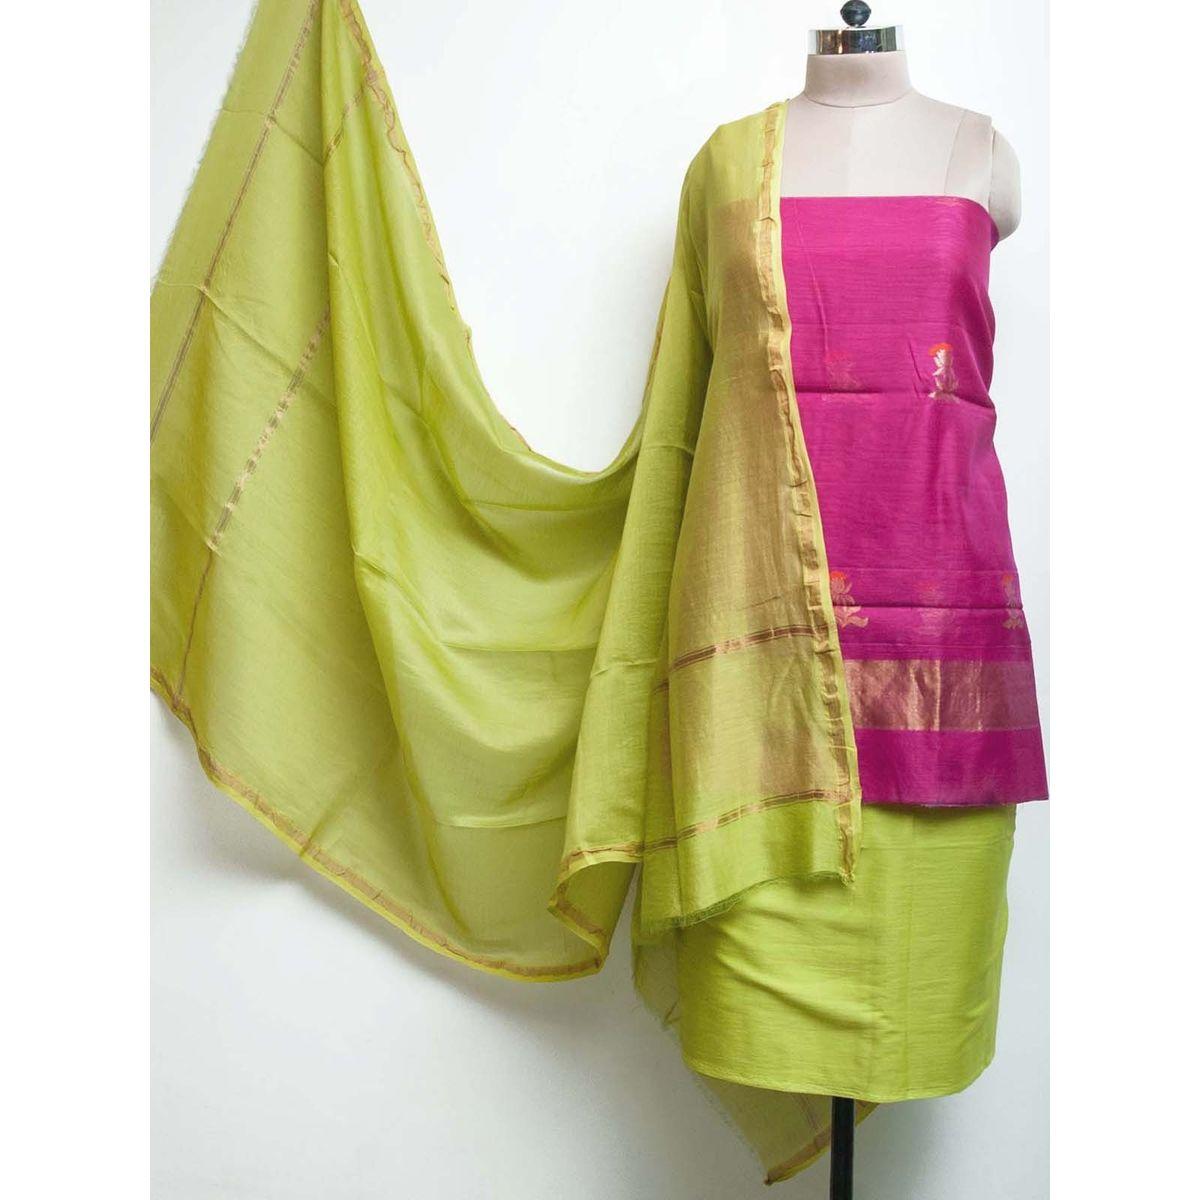 Magenta Chanderi Handwoven Zari Buti Salwar Kurta Fabric with Chanderi Zari Dupatta - set of 4